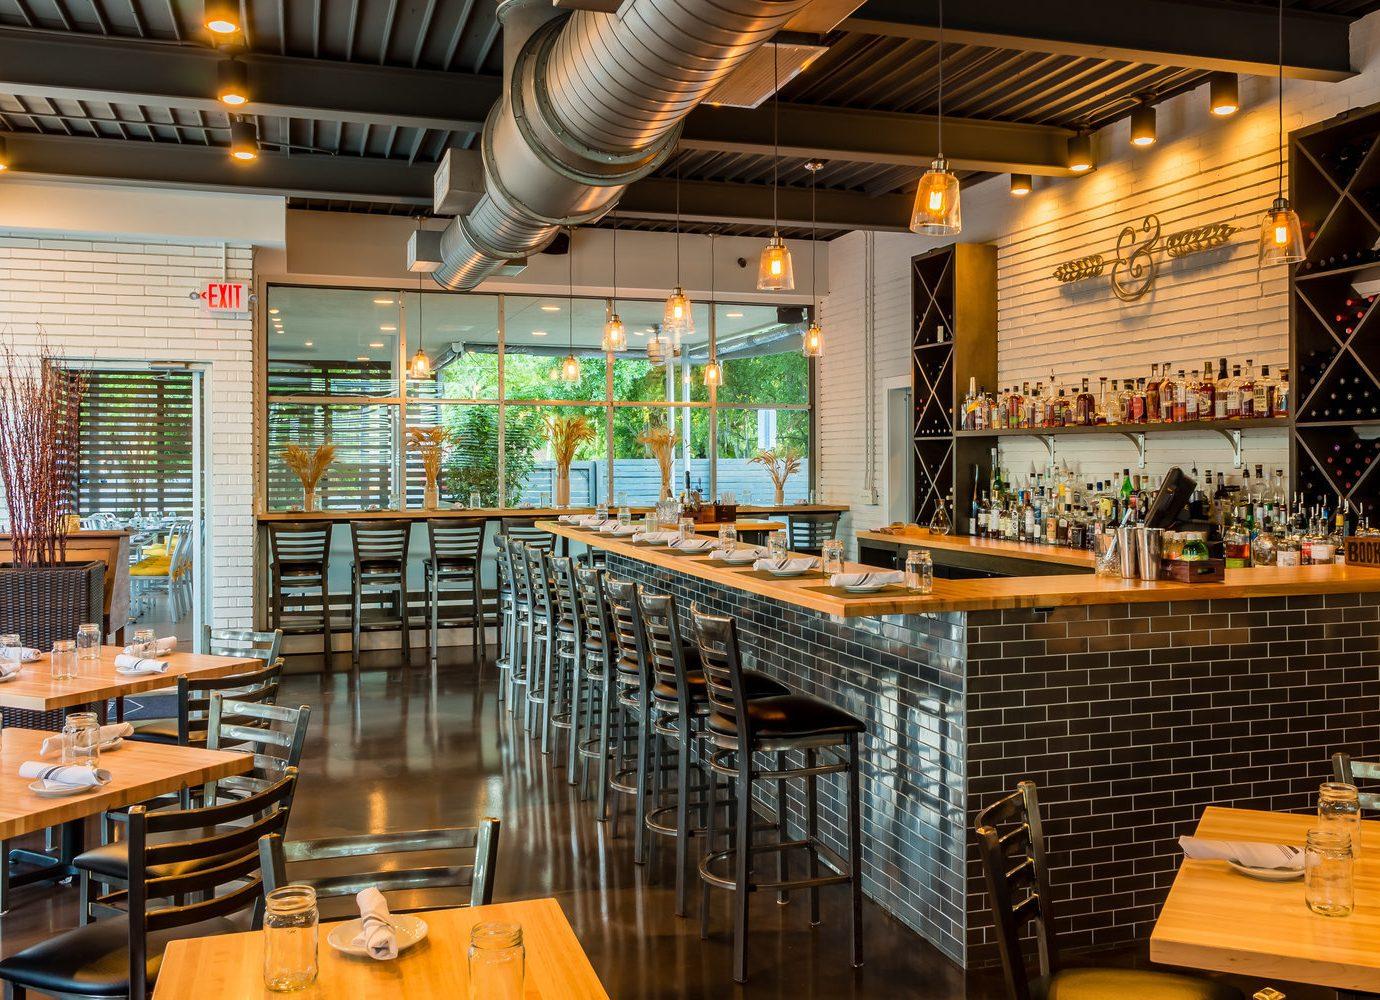 Food + Drink indoor ceiling restaurant interior design café